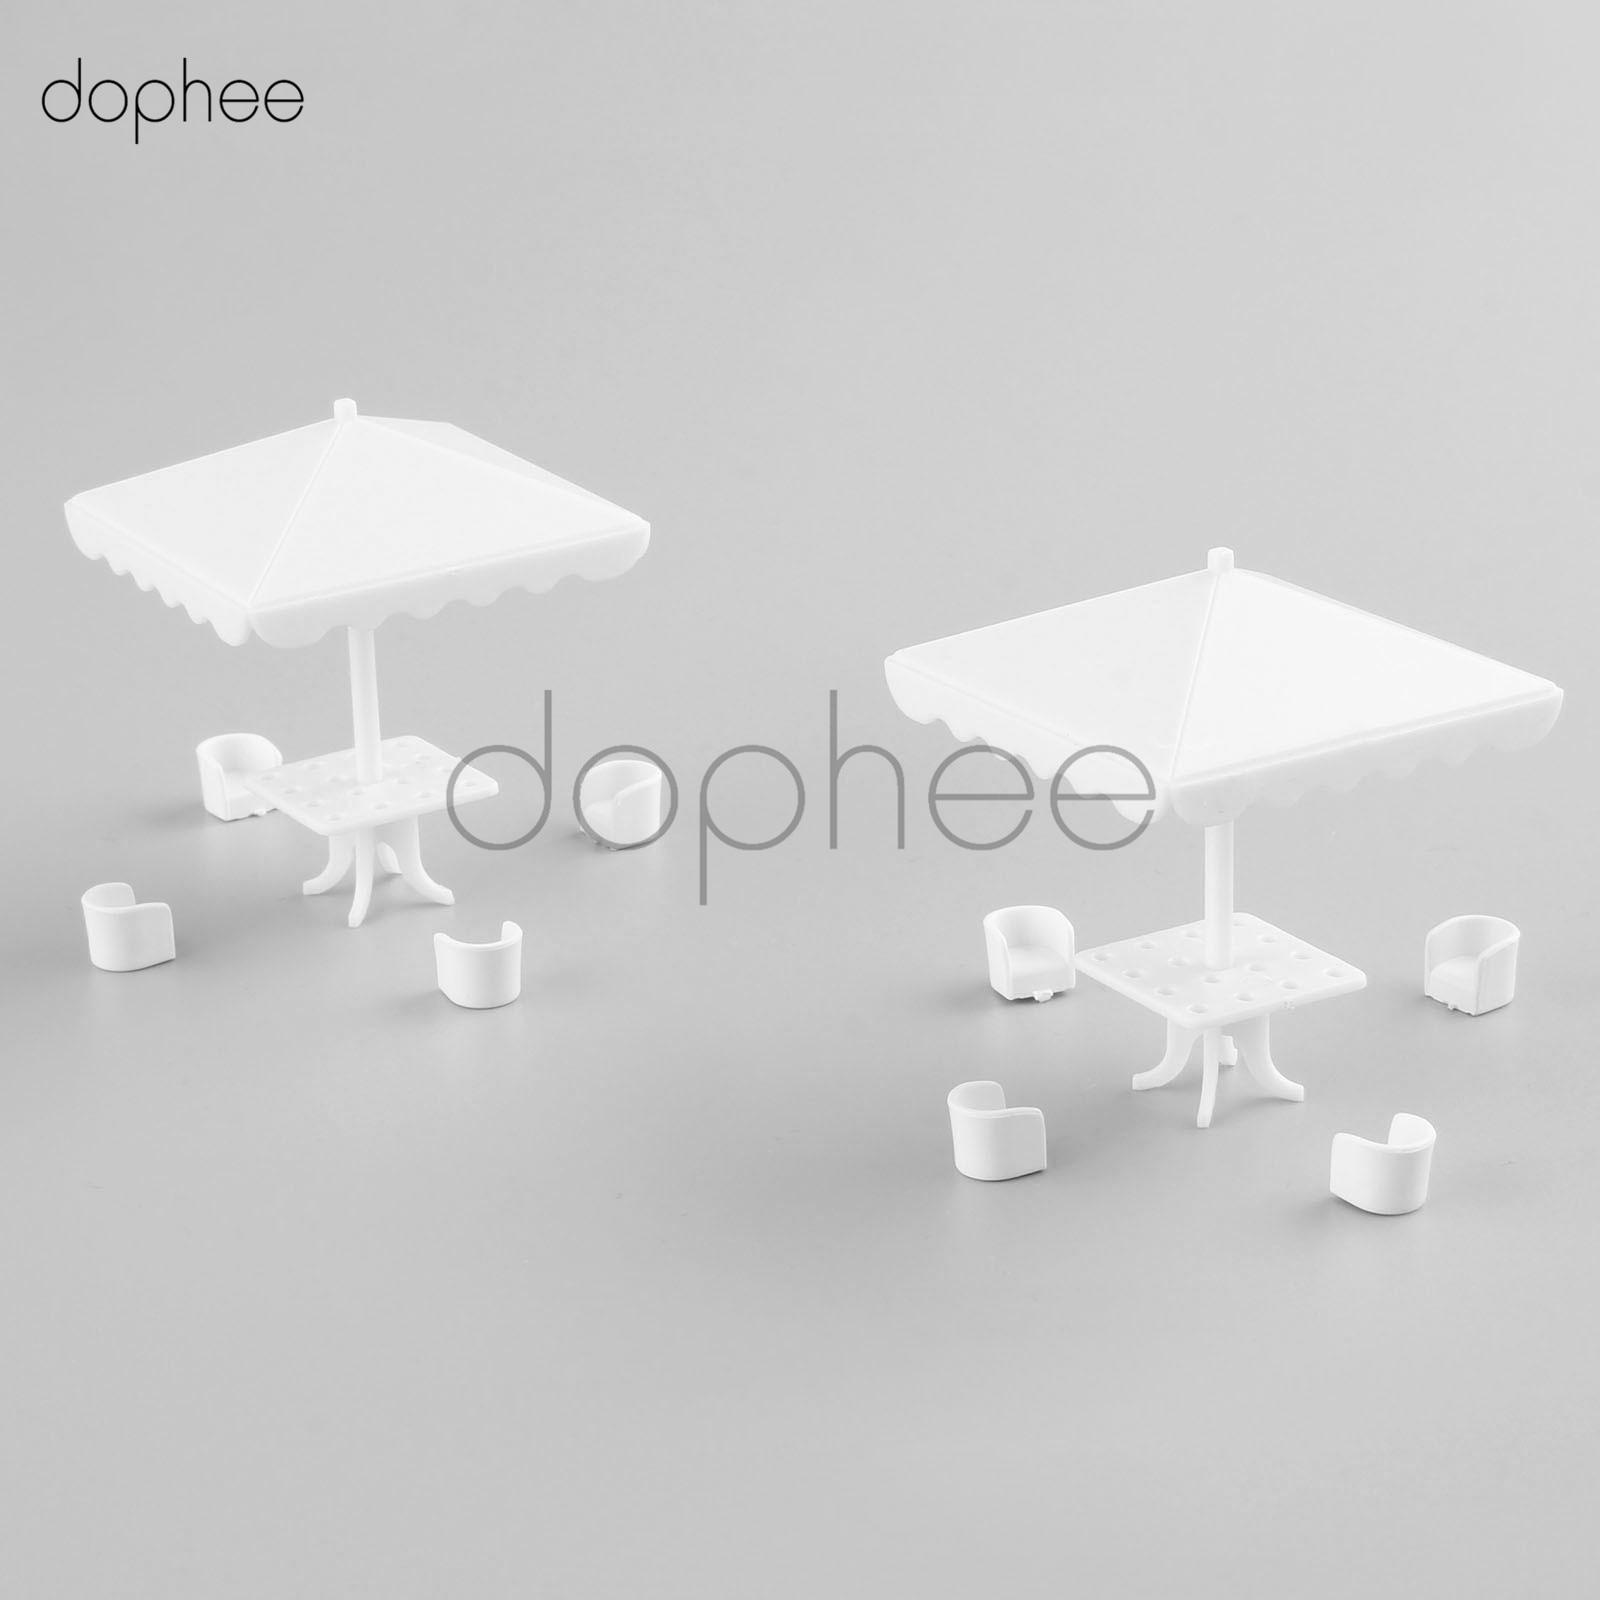 dophee white Plastic 20pcs Chair Model+10pcs Square parasol Model furniture architecture DIY train layout Model scale 1:75